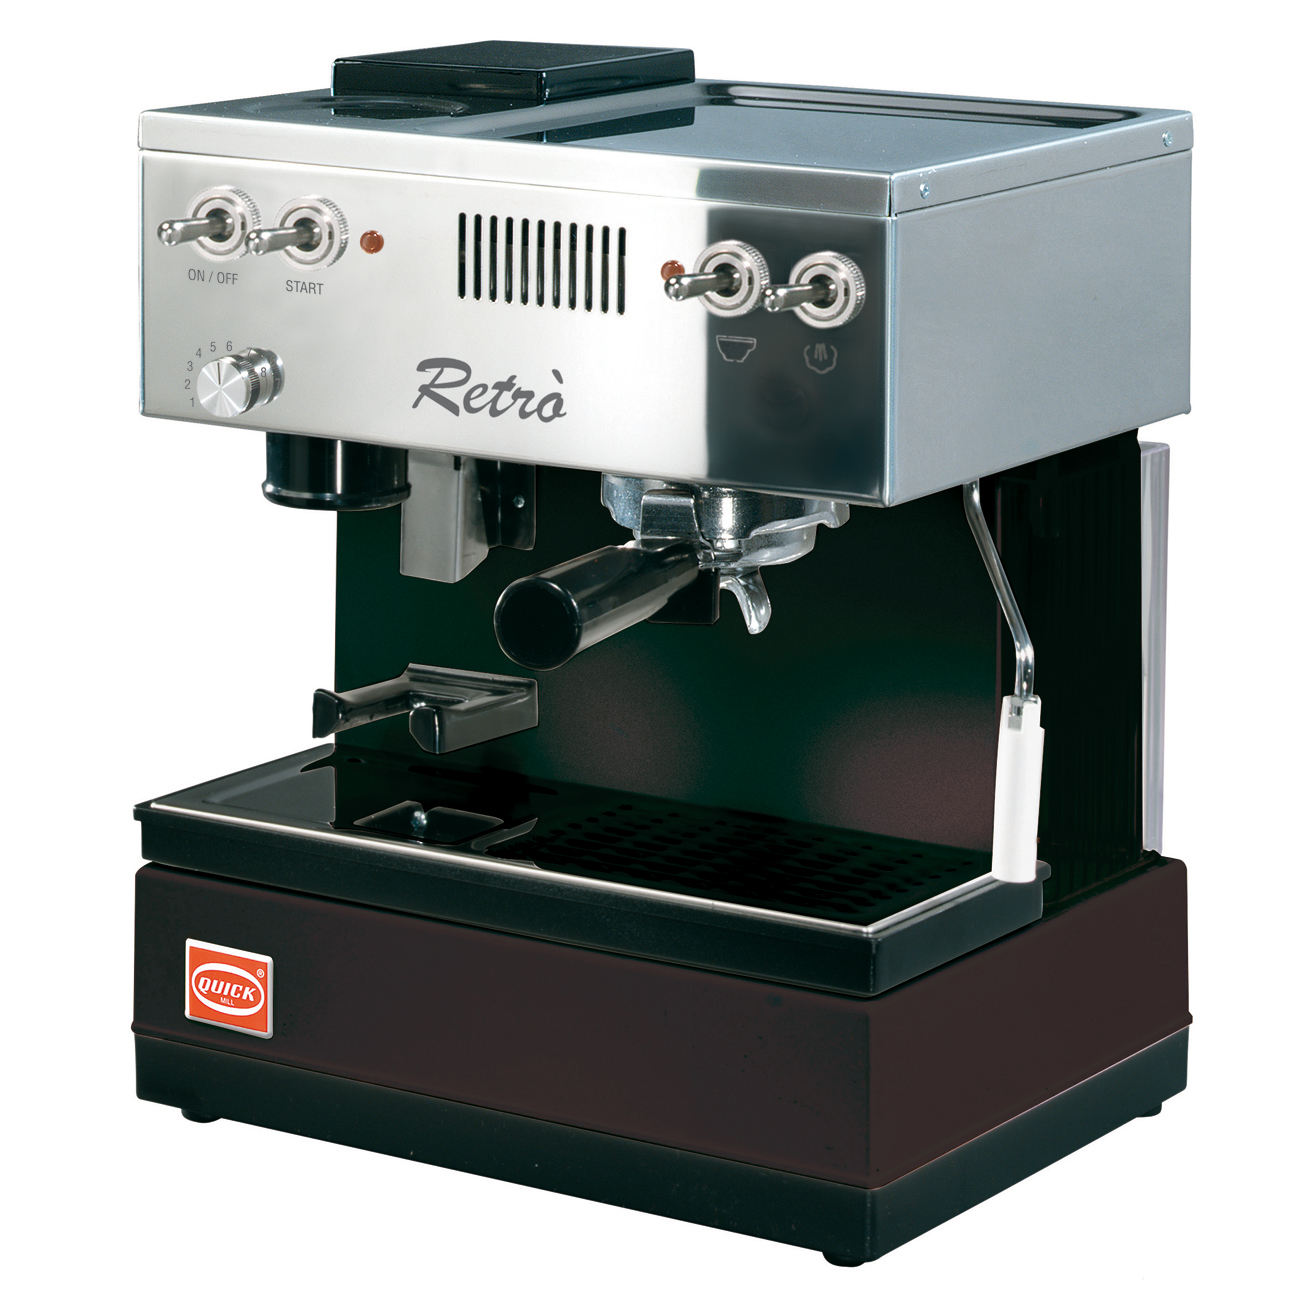 Quickmill Modell 0835 Retro Espressomaschine